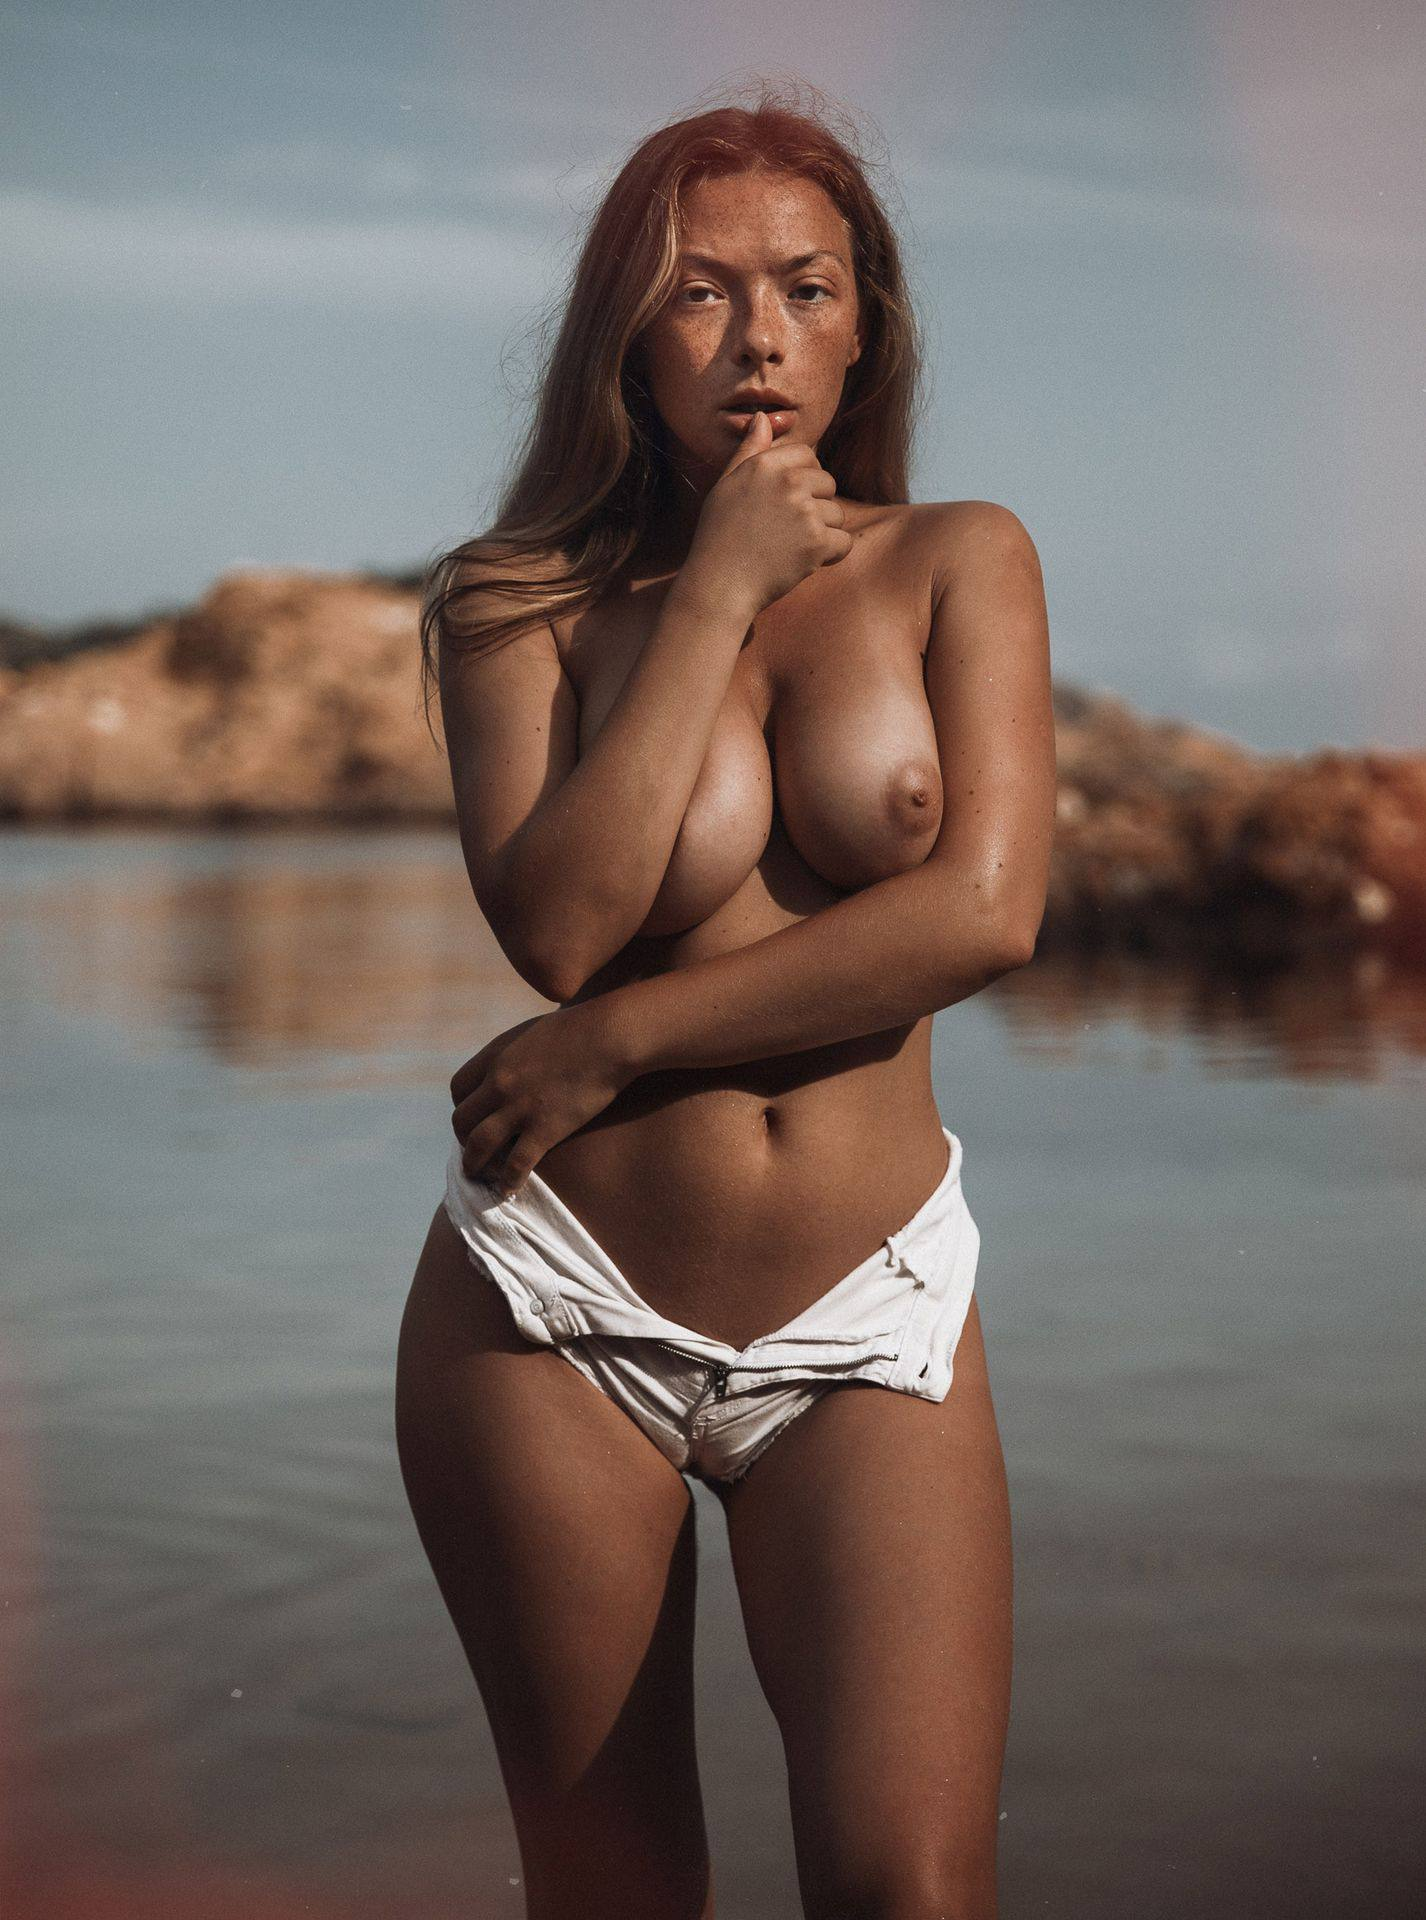 Olga Kobzar – Hot Big Boobs In Sexy Full Frontal Nude Photoshoot By Thomas Agatz (nsfw) 0015